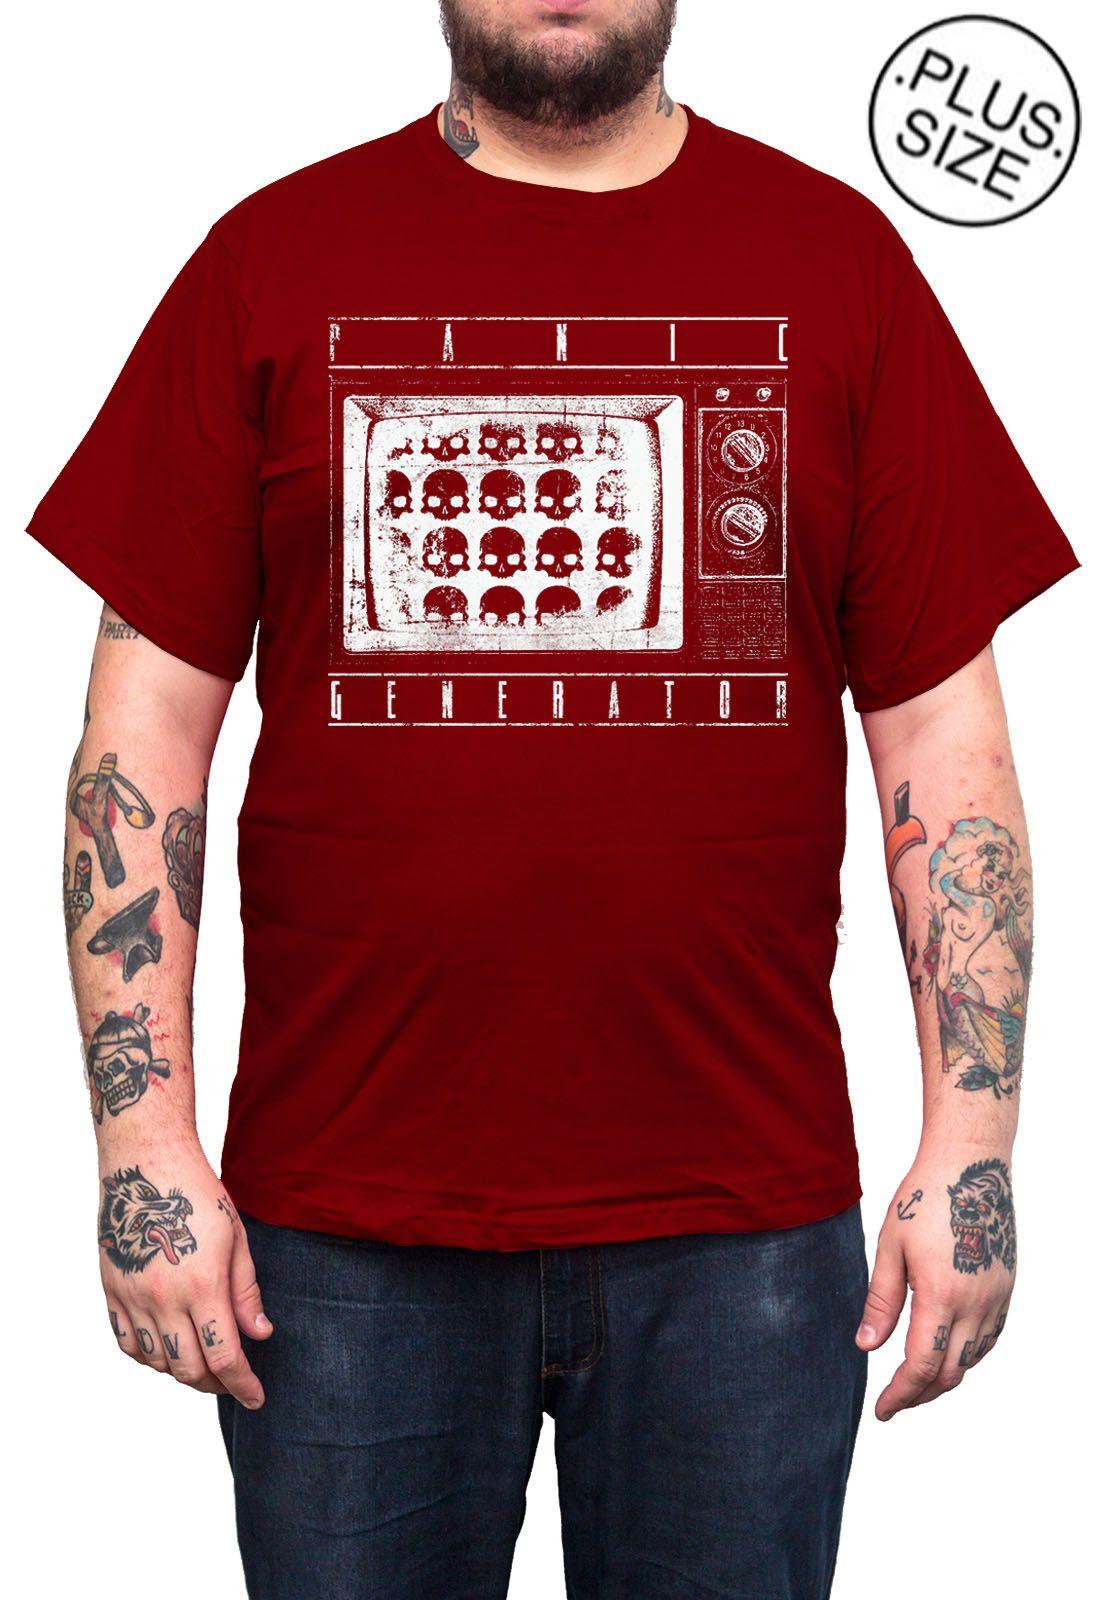 Camiseta Hshop Death By TV - Vinho - Plus Size - Tamanho Grande XG  - HShop